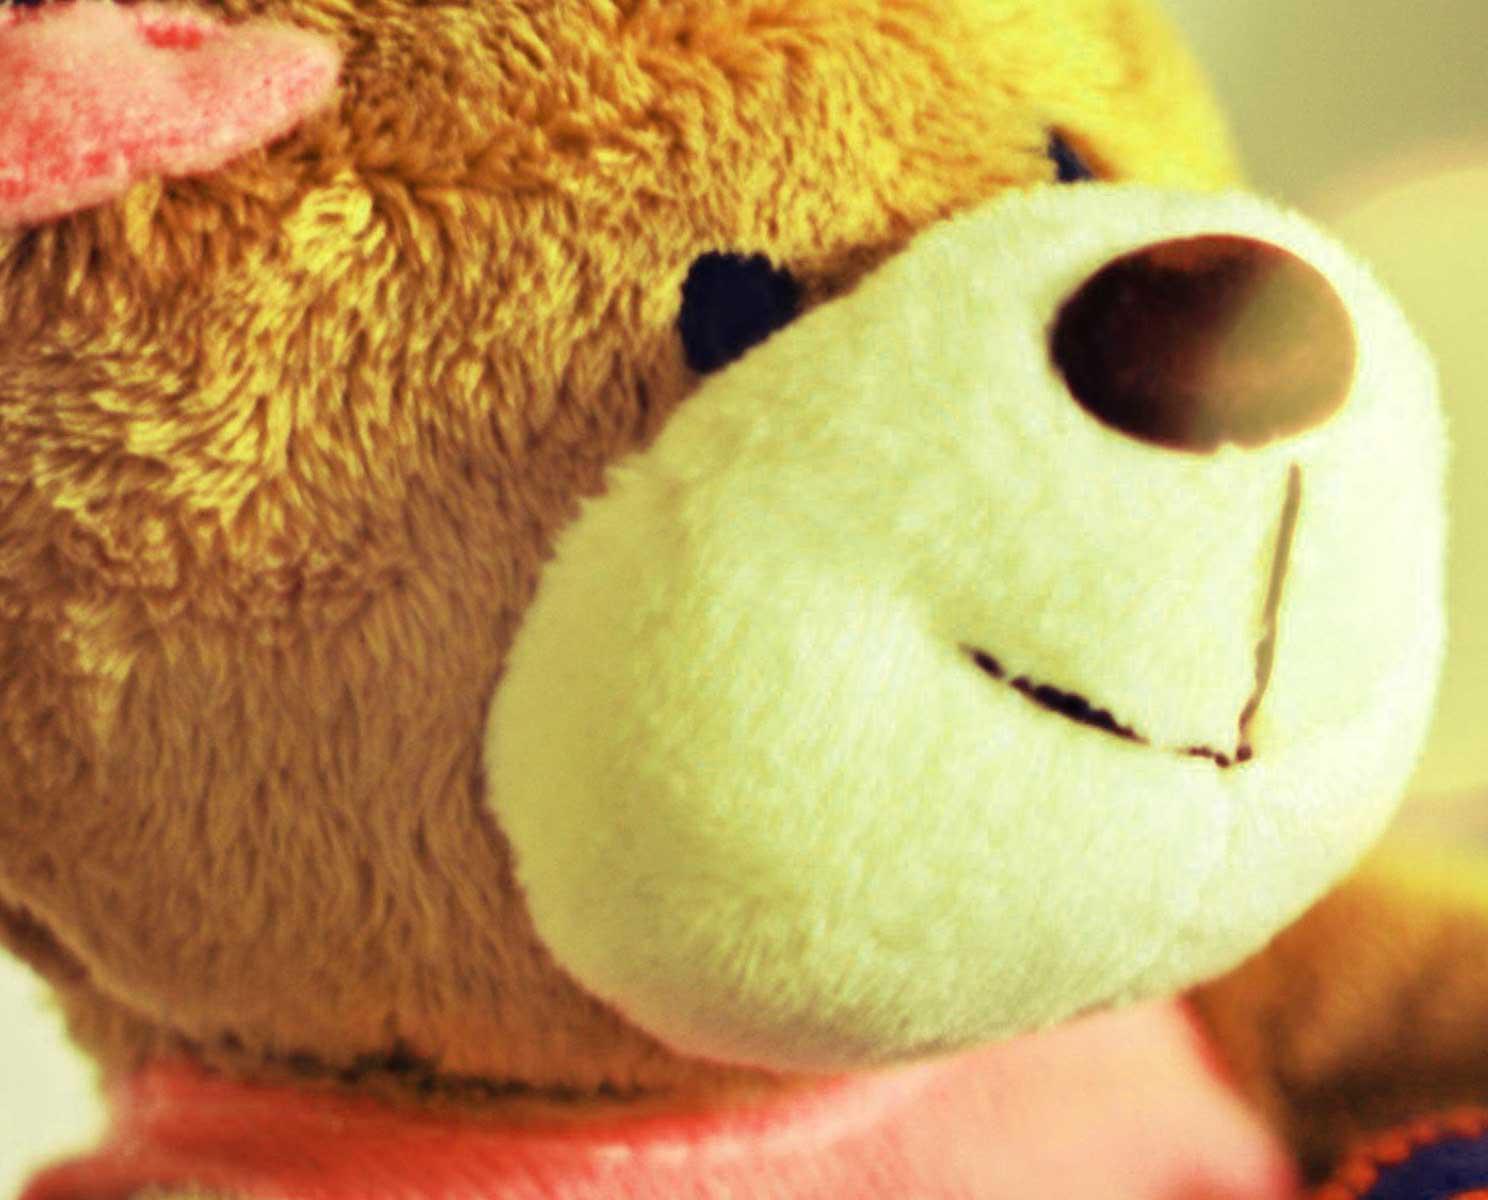 Teddy%2BBear%2BImages%2BPics%2BHD1